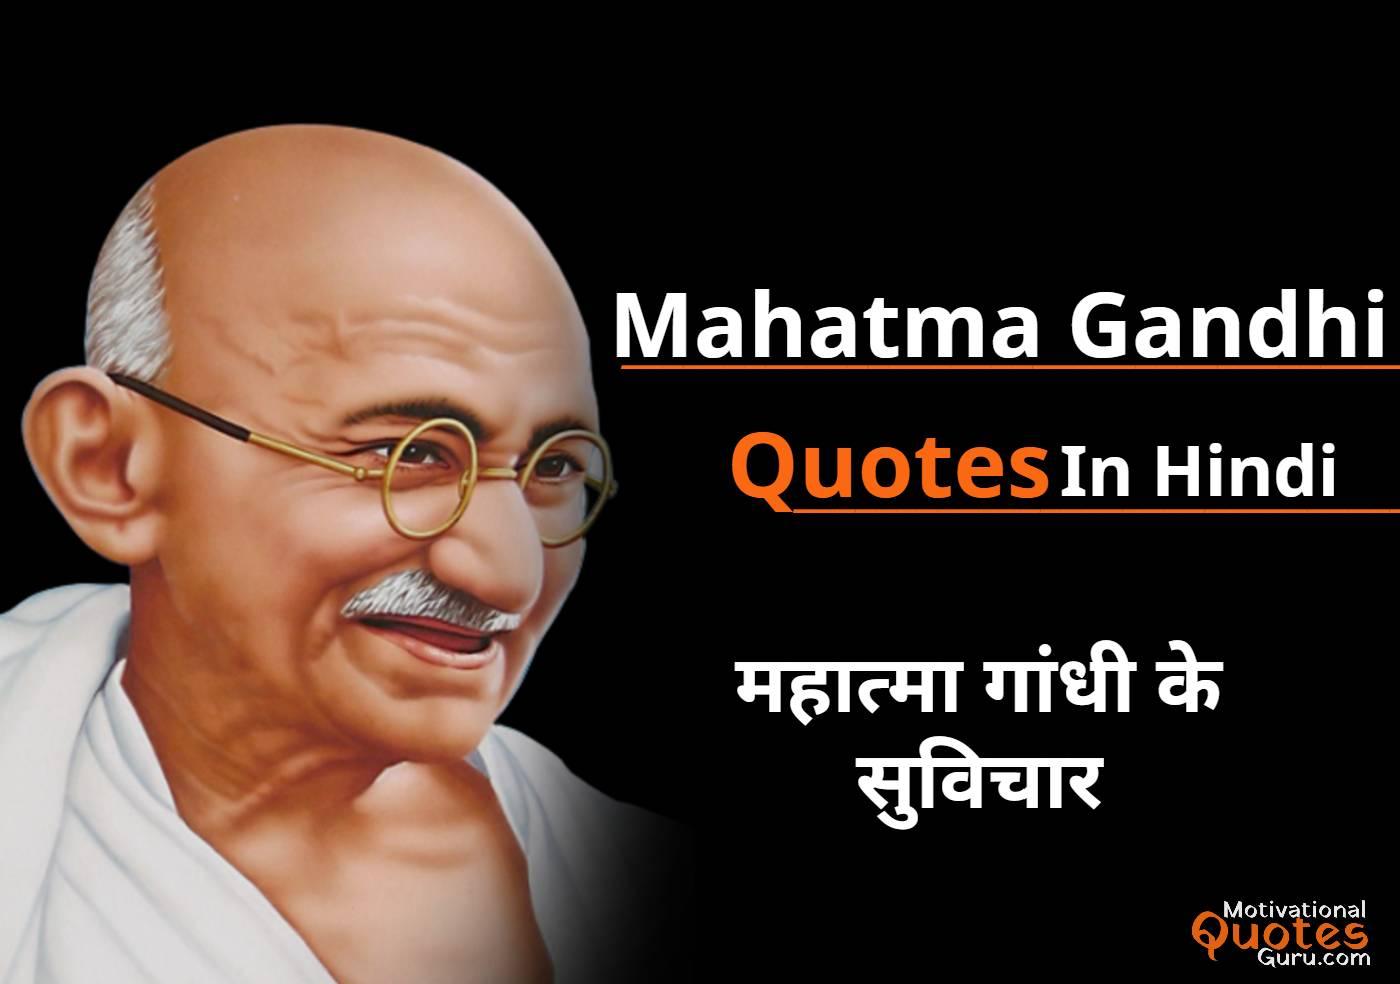 [𝓑𝓮𝓼𝓽 40 Mahatma Gandhi 𝙌𝙪𝙤𝙩𝙚𝙨]▷महात्मा गाँधी के विचार